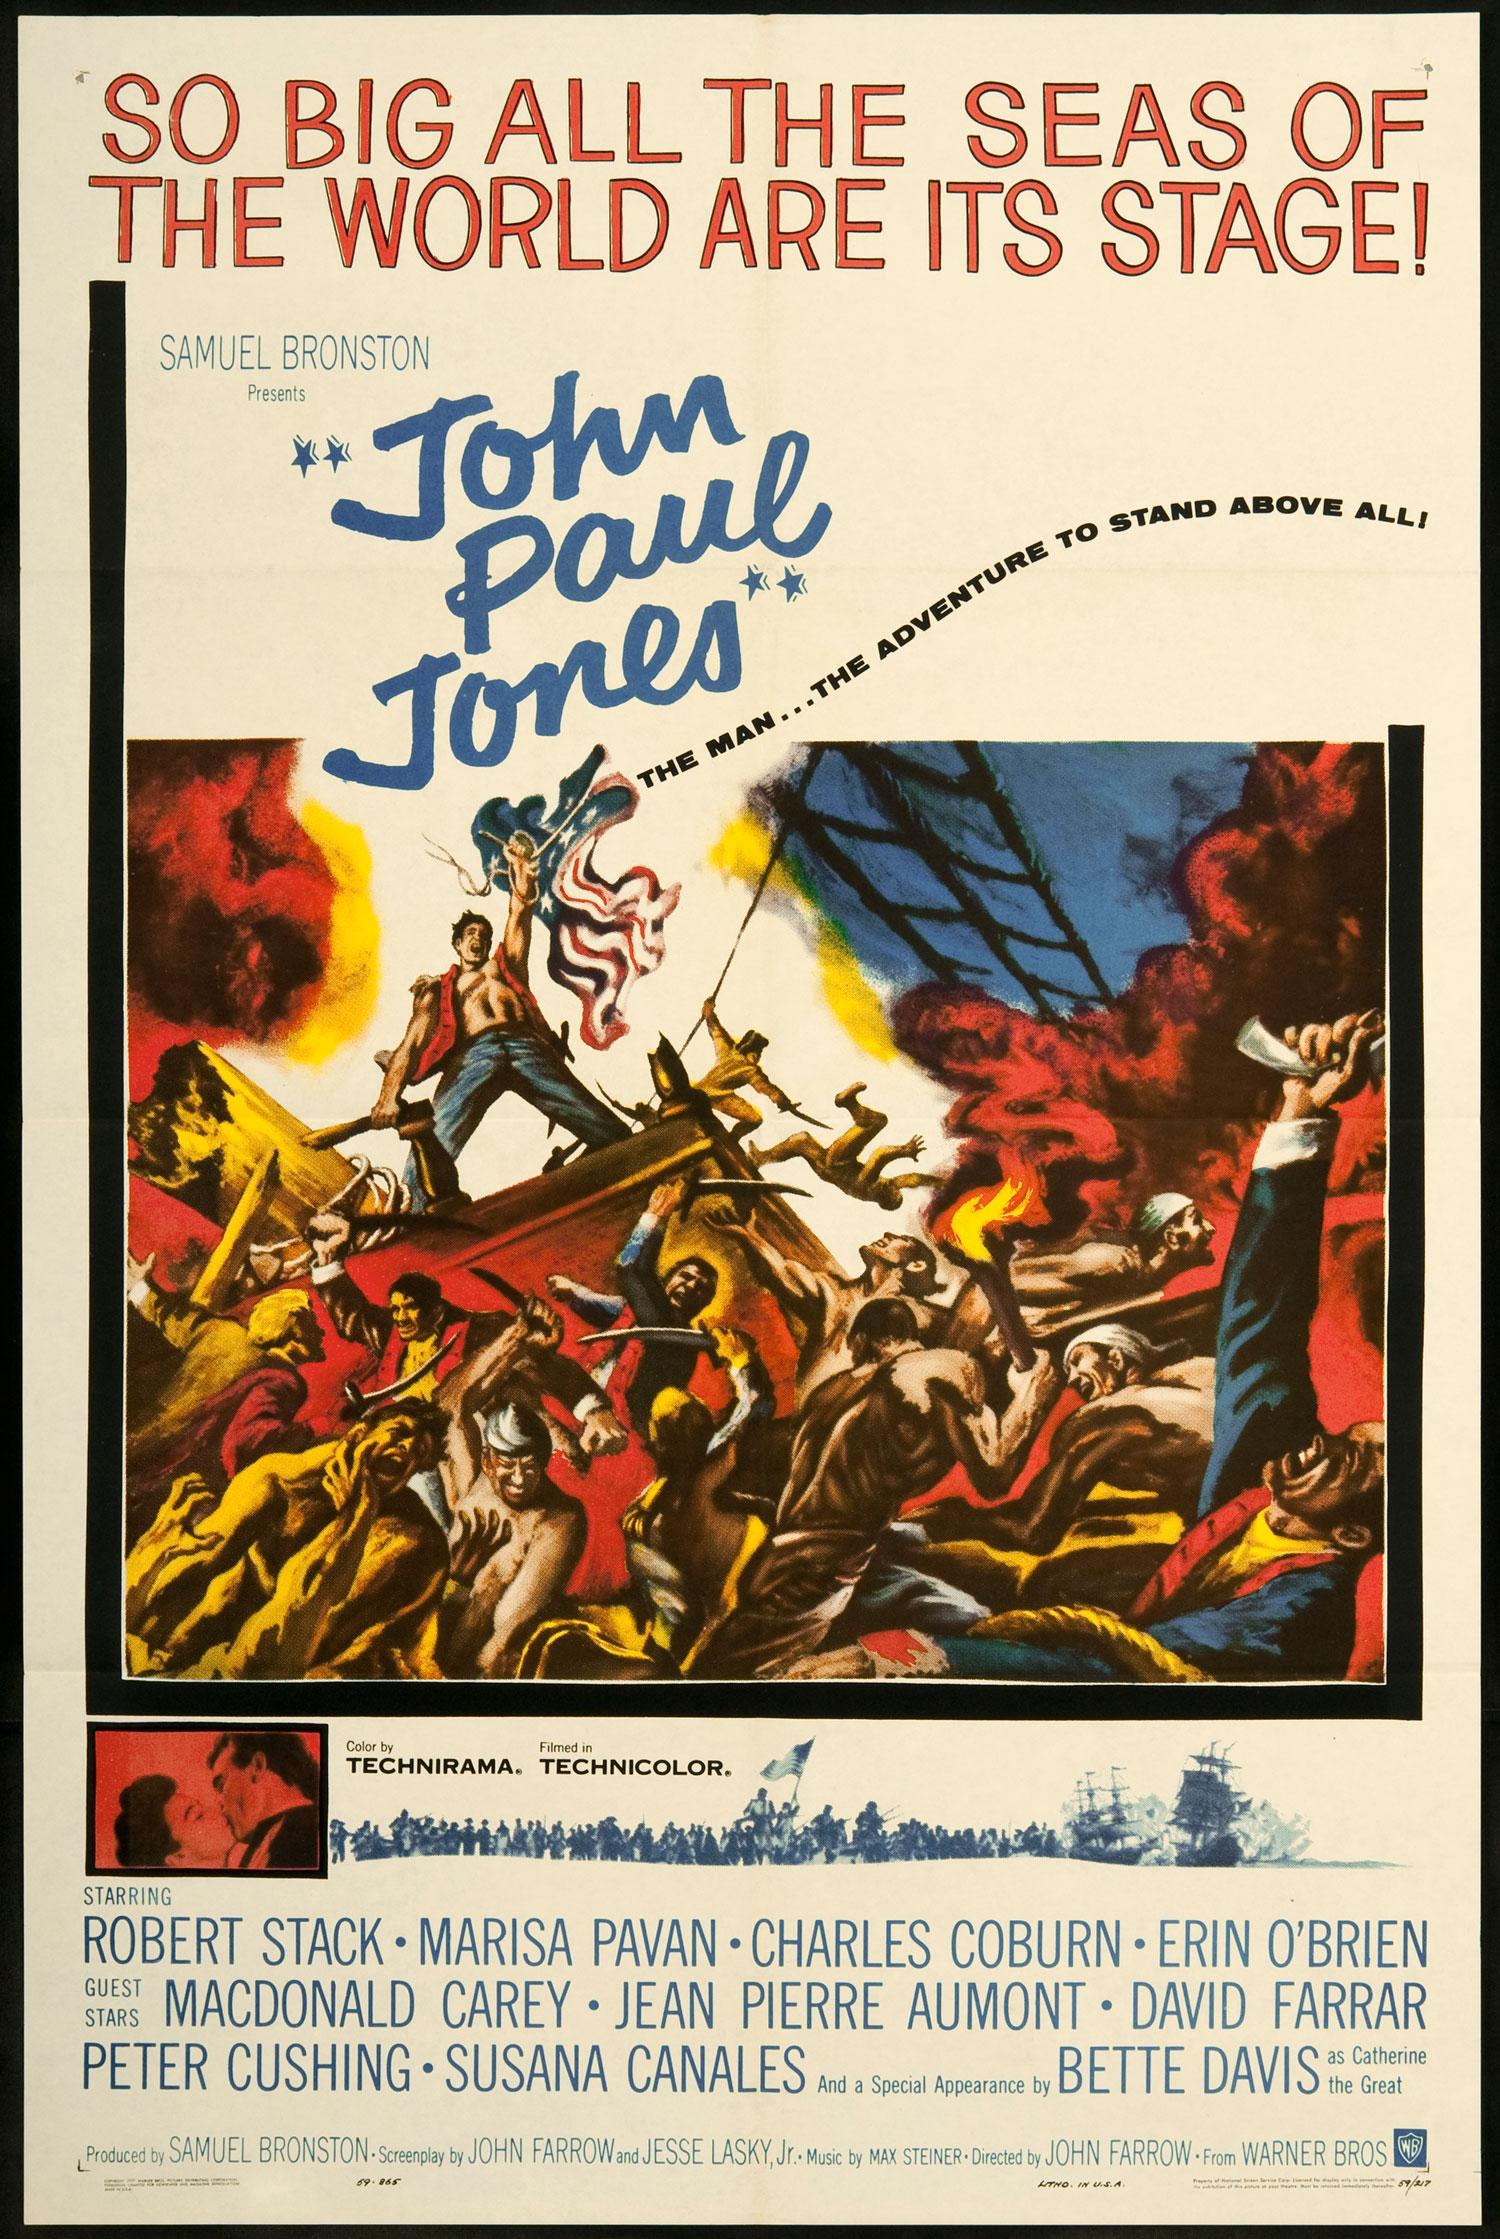 image John Paul Jones Watch Full Movie Free Online